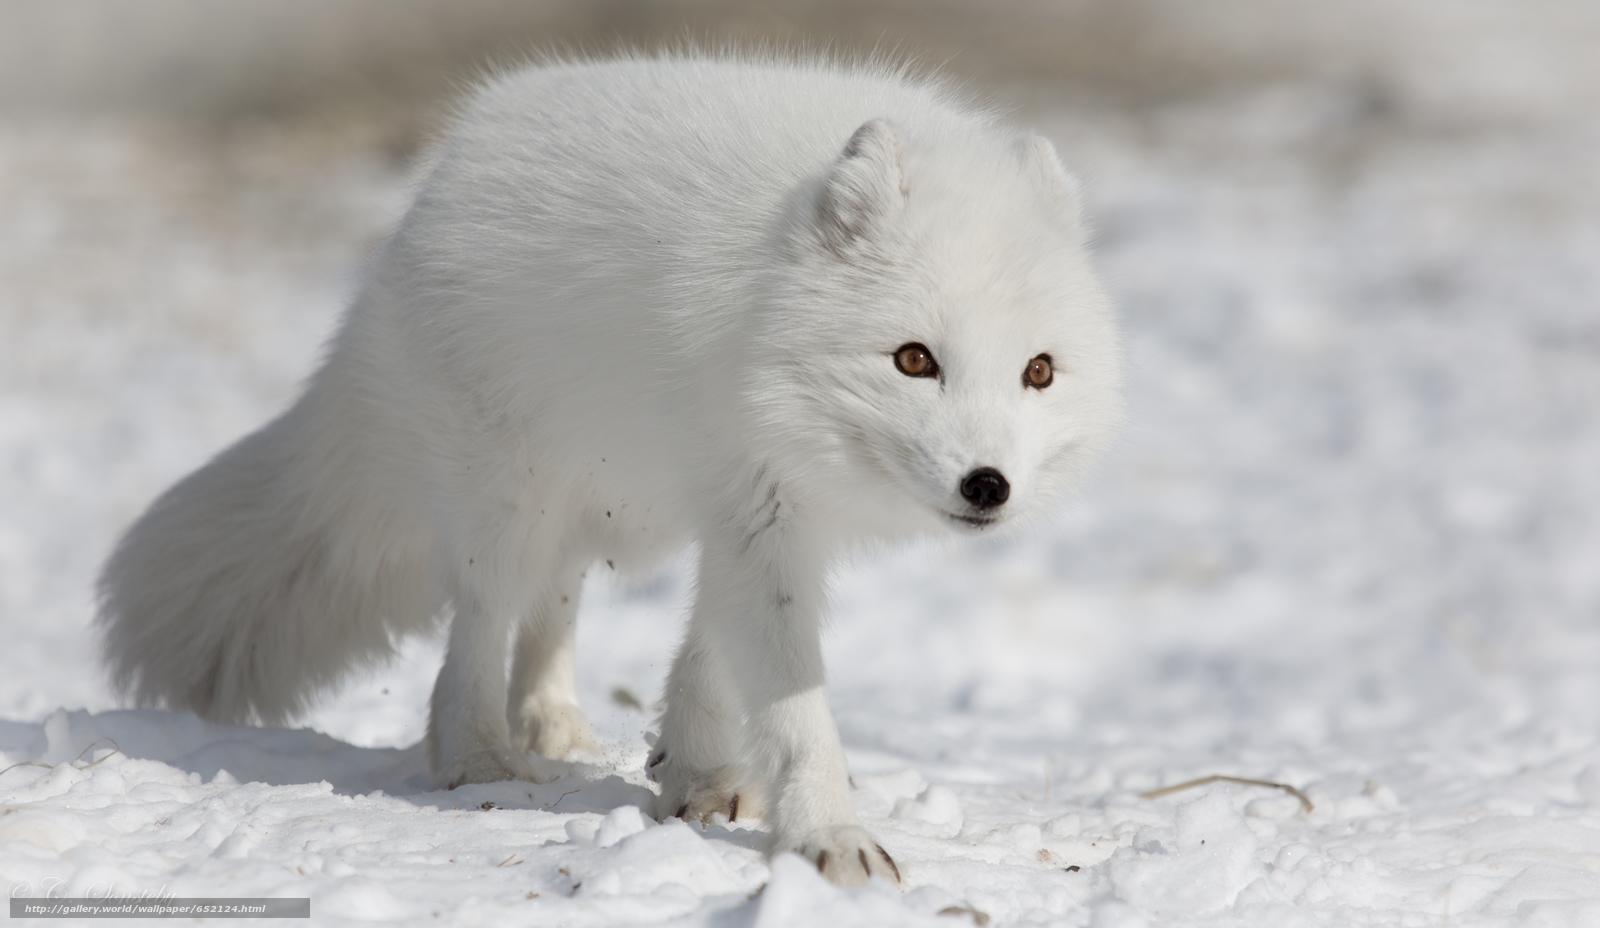 Tlcharger Fond D Ecran Le Renard Arctique Blanc Renards